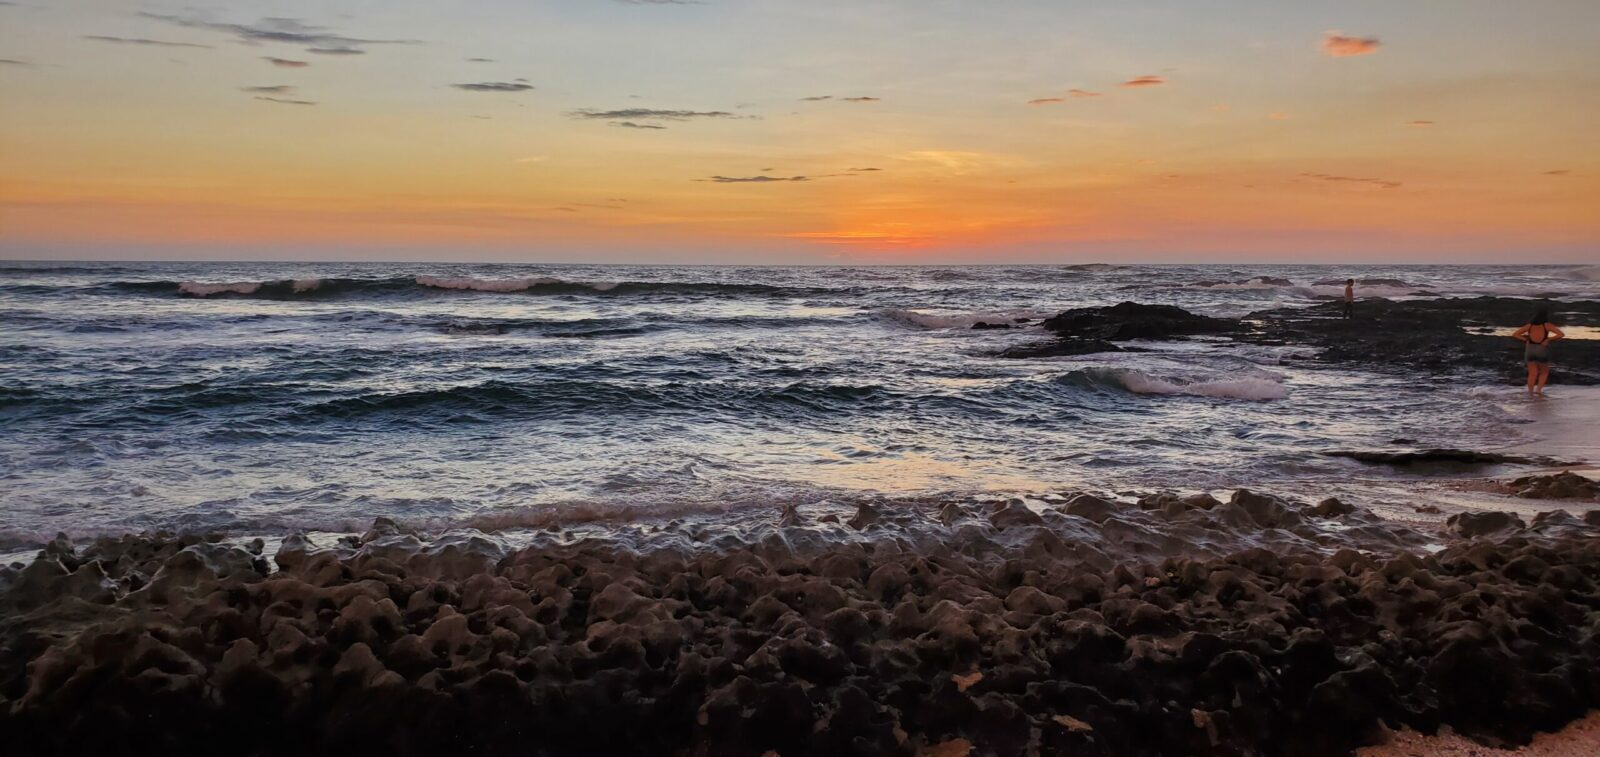 Why do I love Costa Rica?